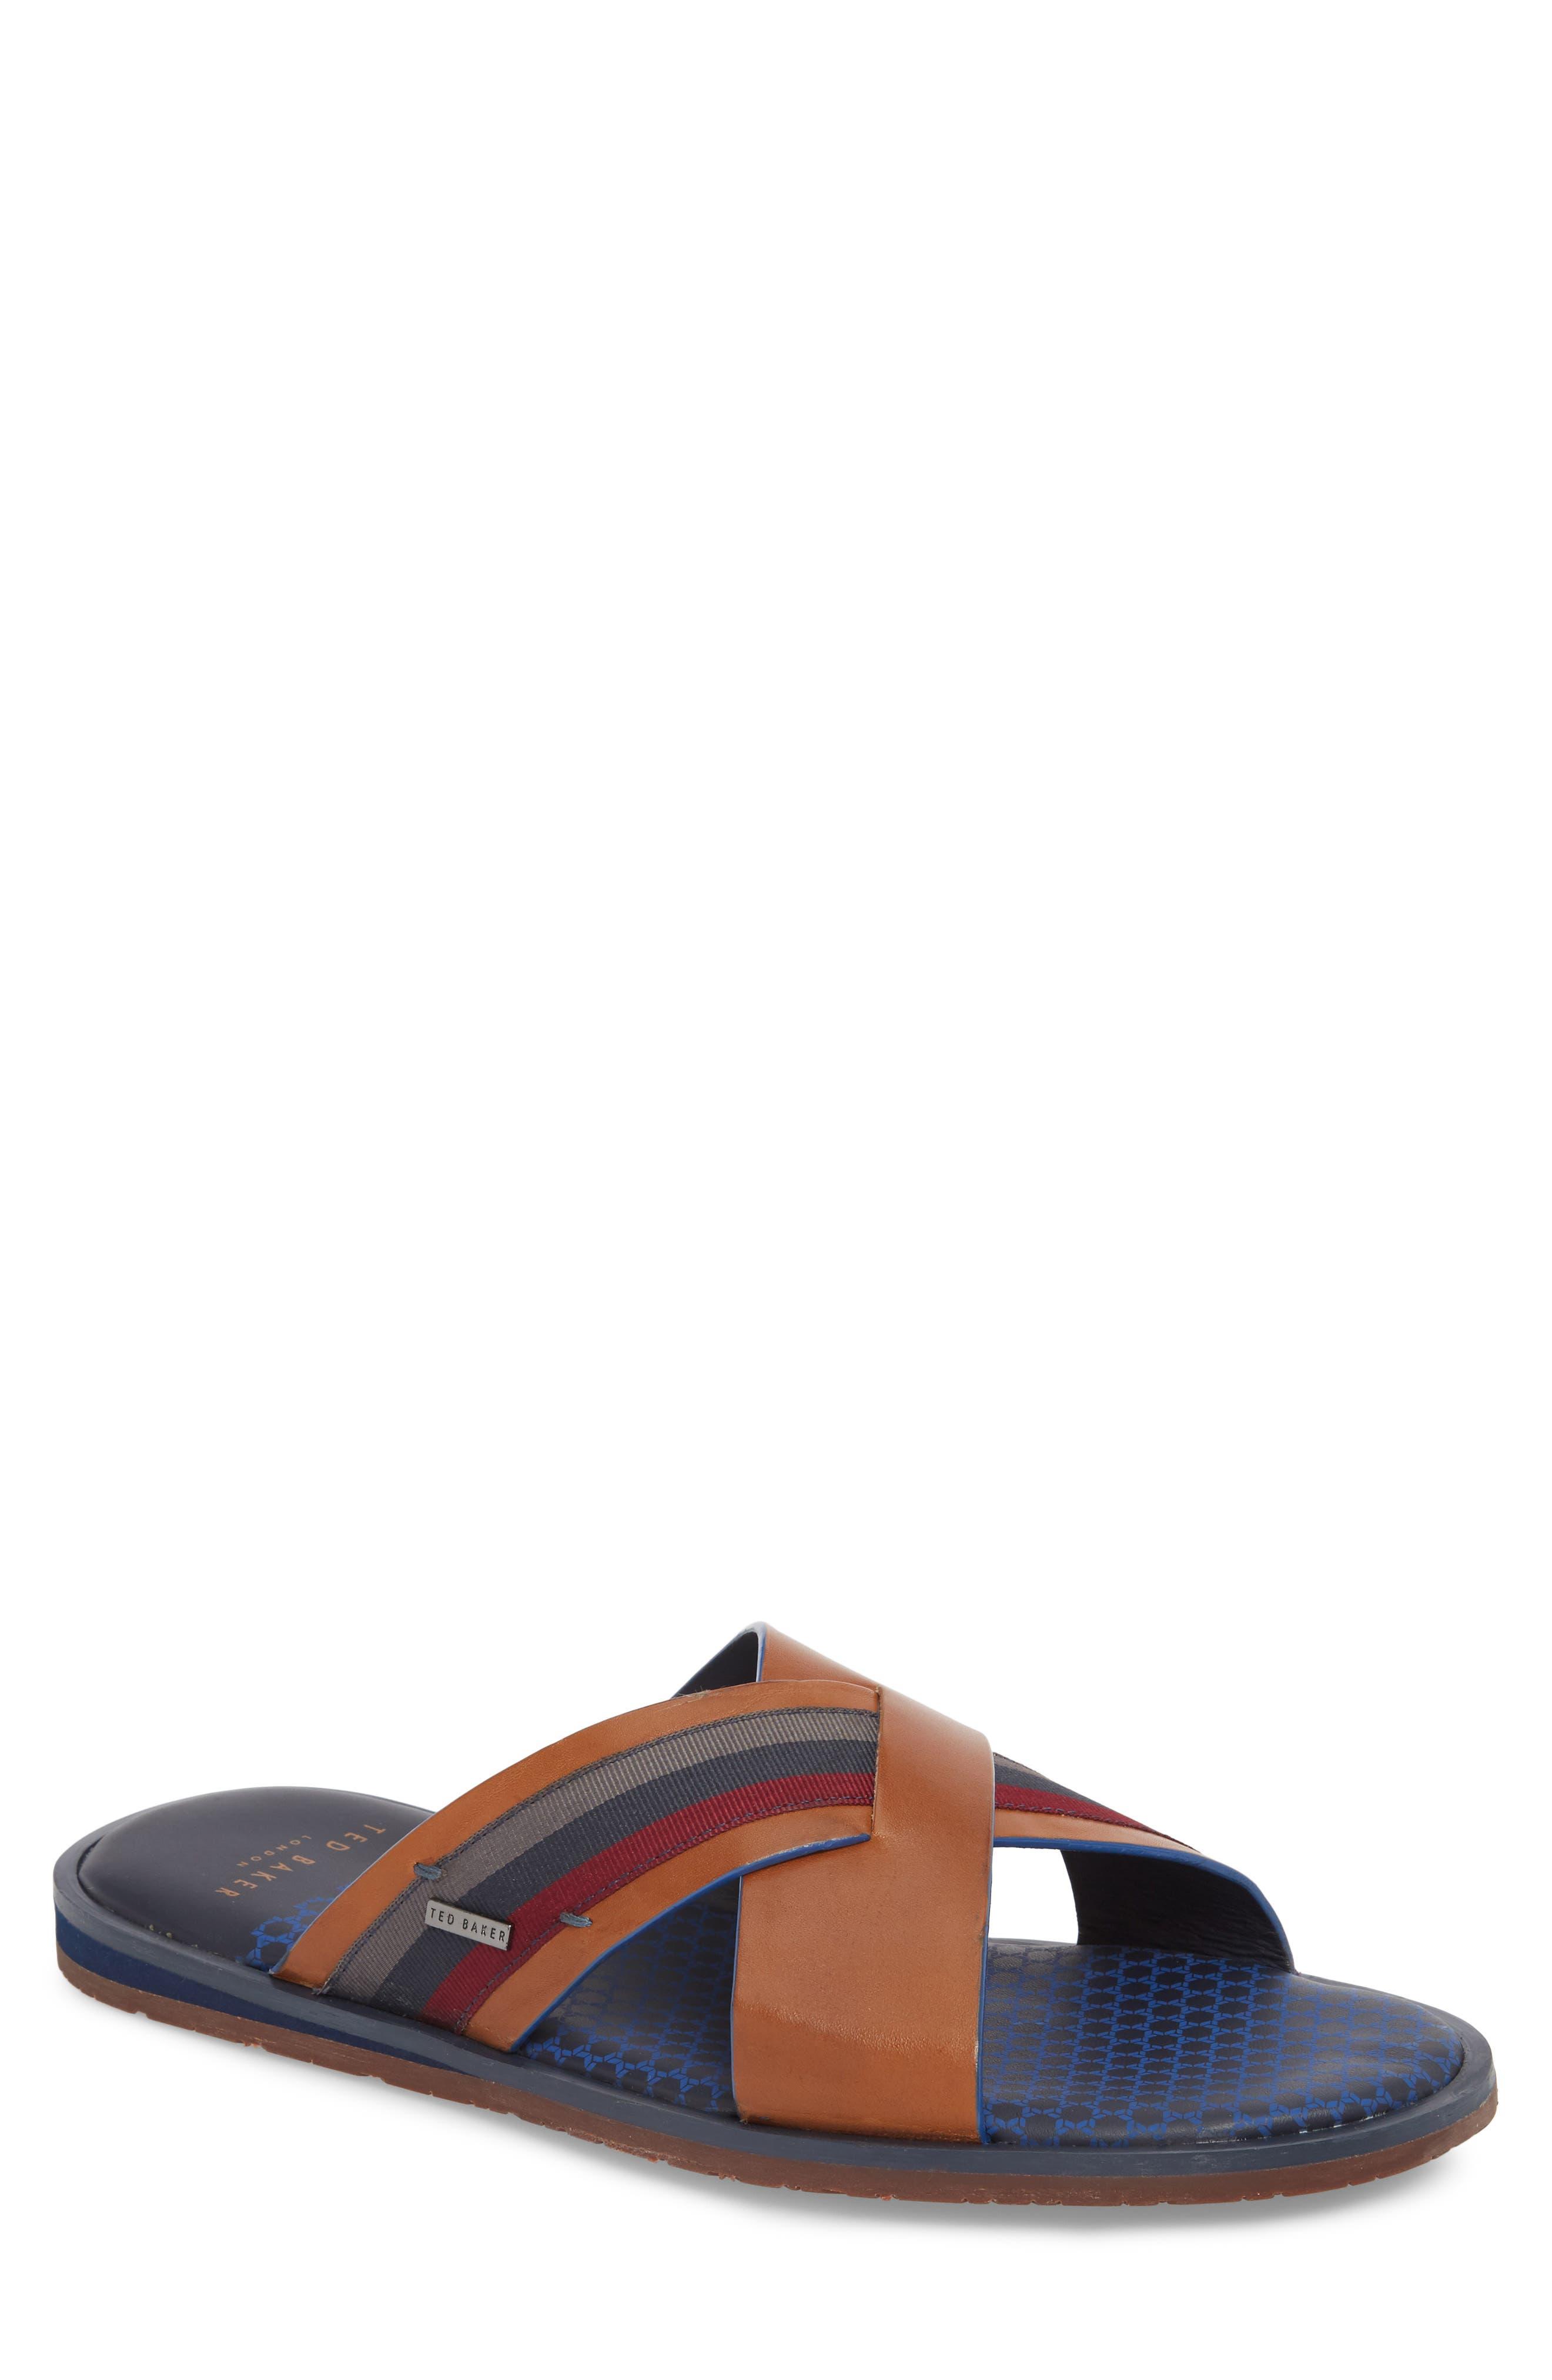 Farrull Cross Strap Slide Sandal,                             Main thumbnail 1, color,                             204